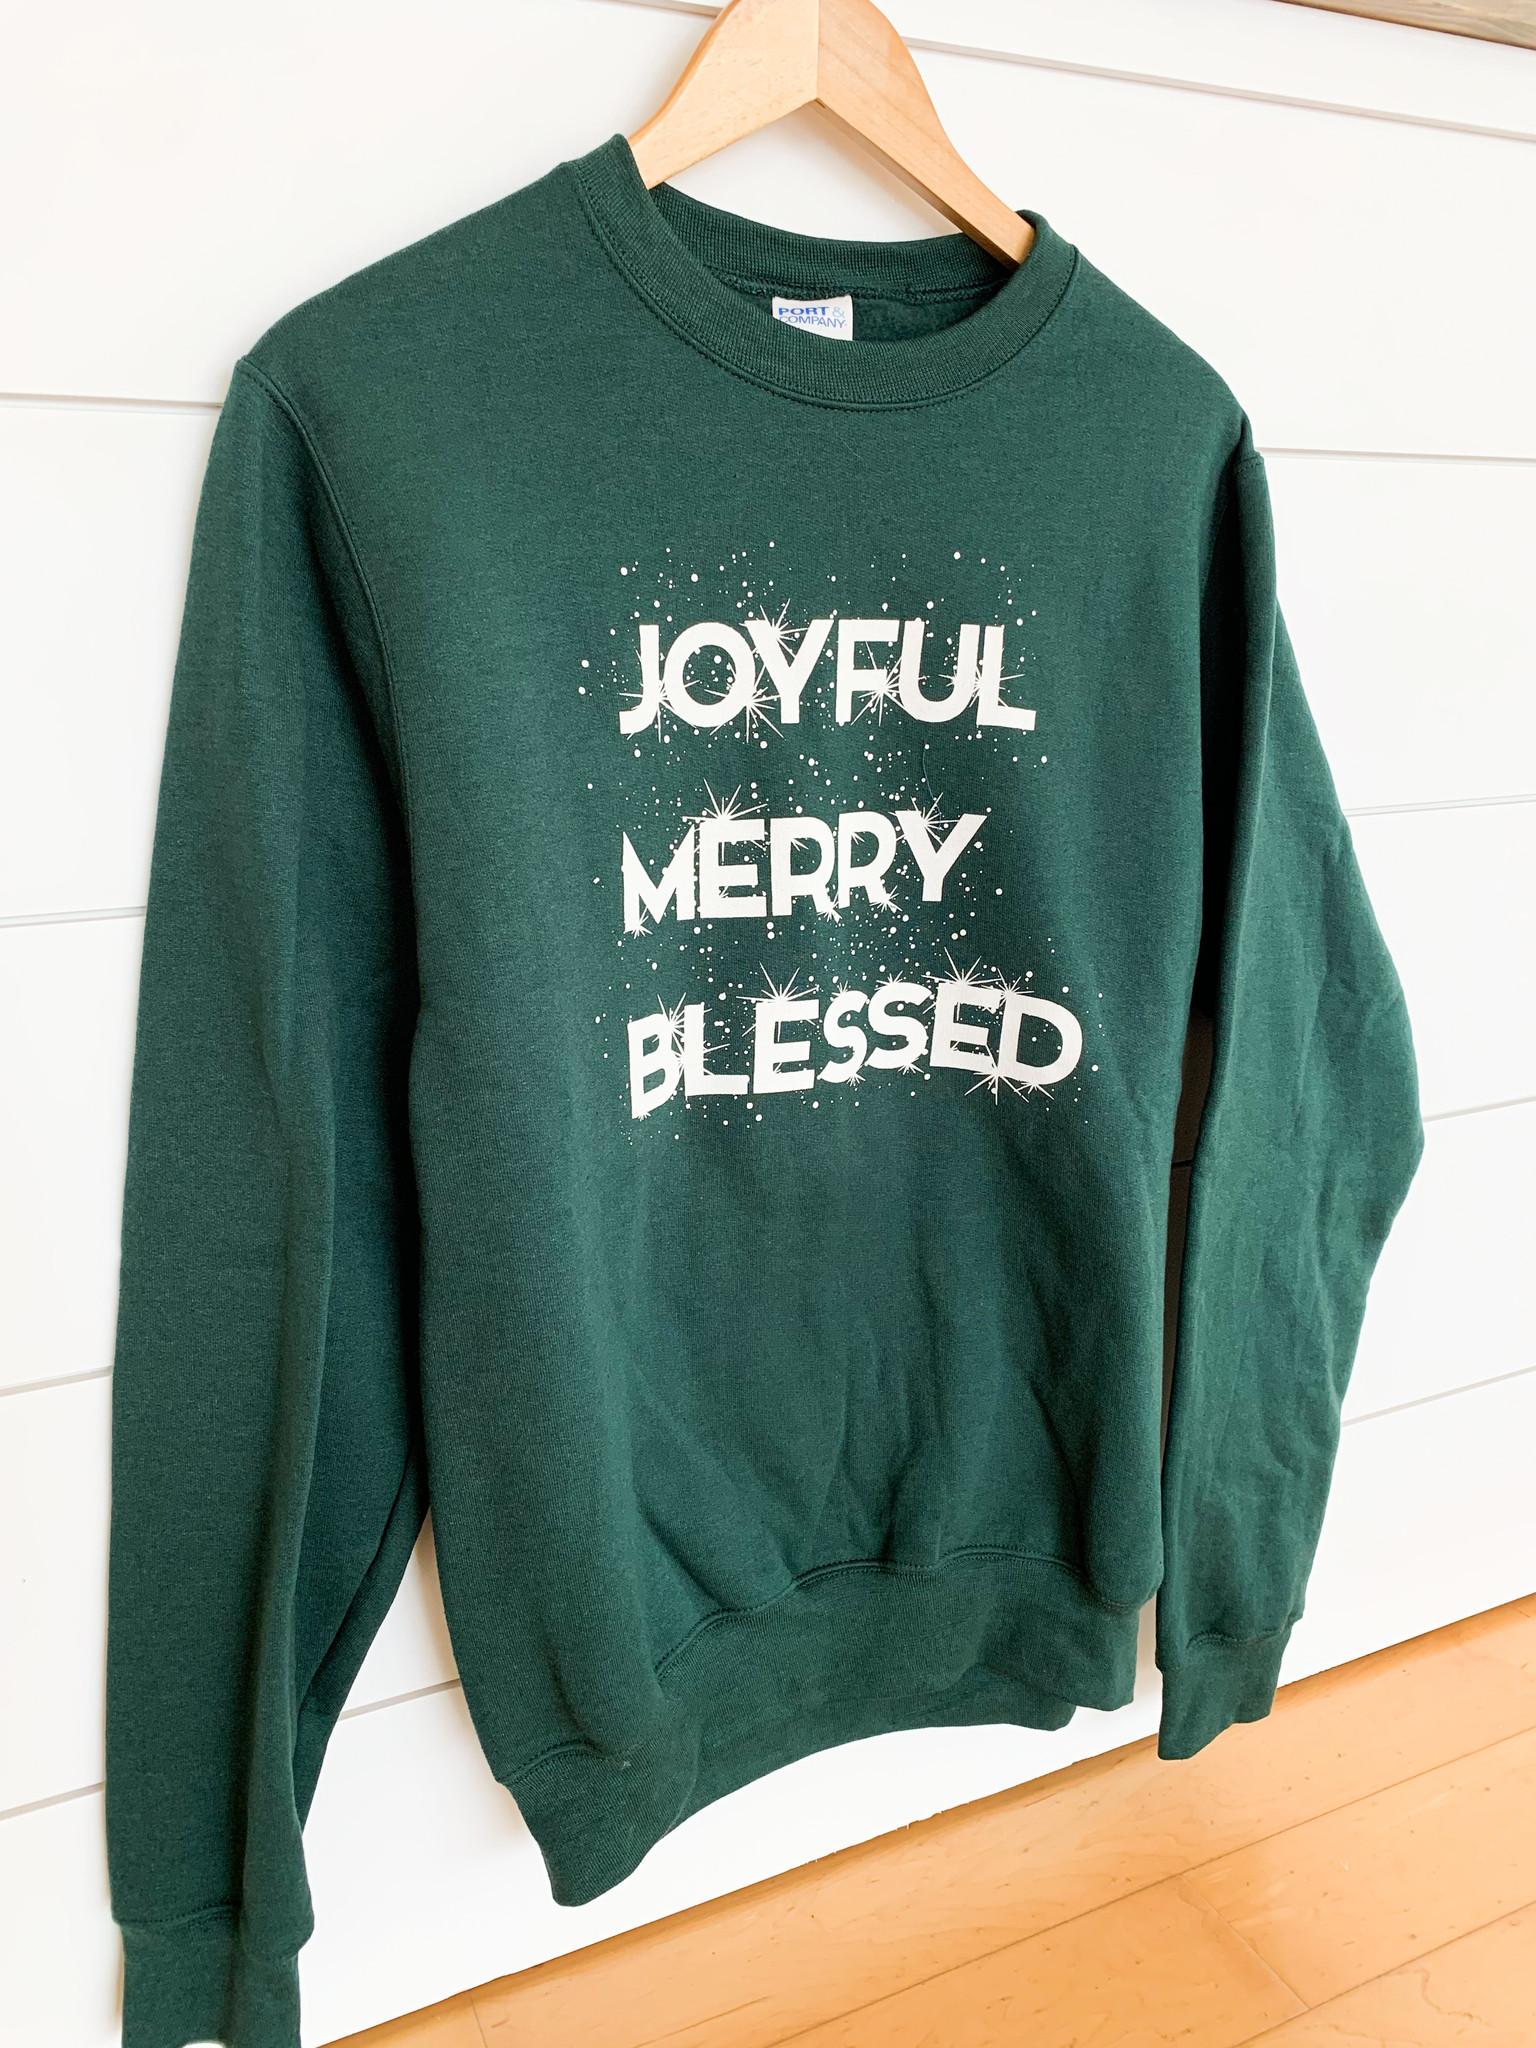 Joyful Merry Blessed Sweatshirt